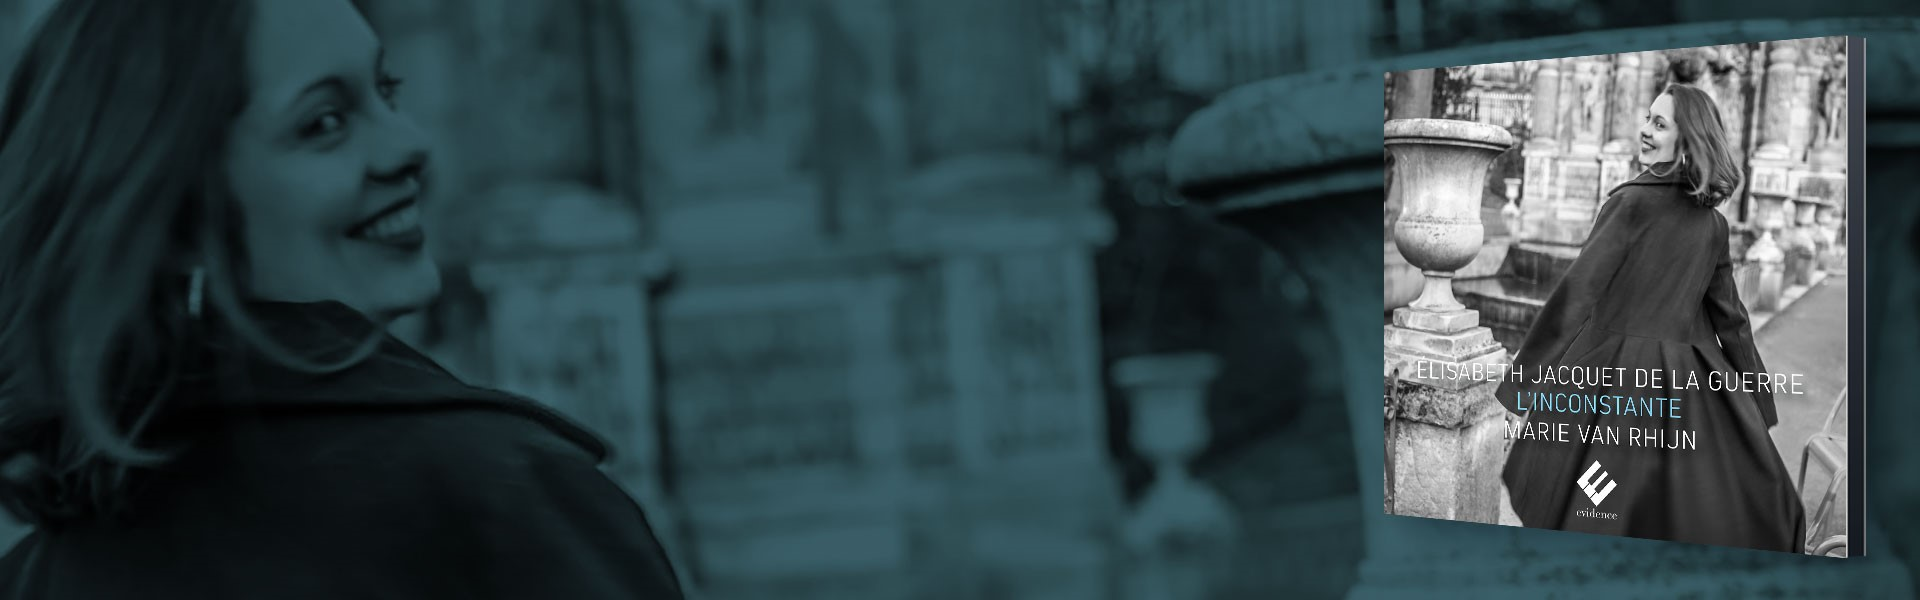 Jacquet de la Guerre: L'inconstante | Marie van Rhijn